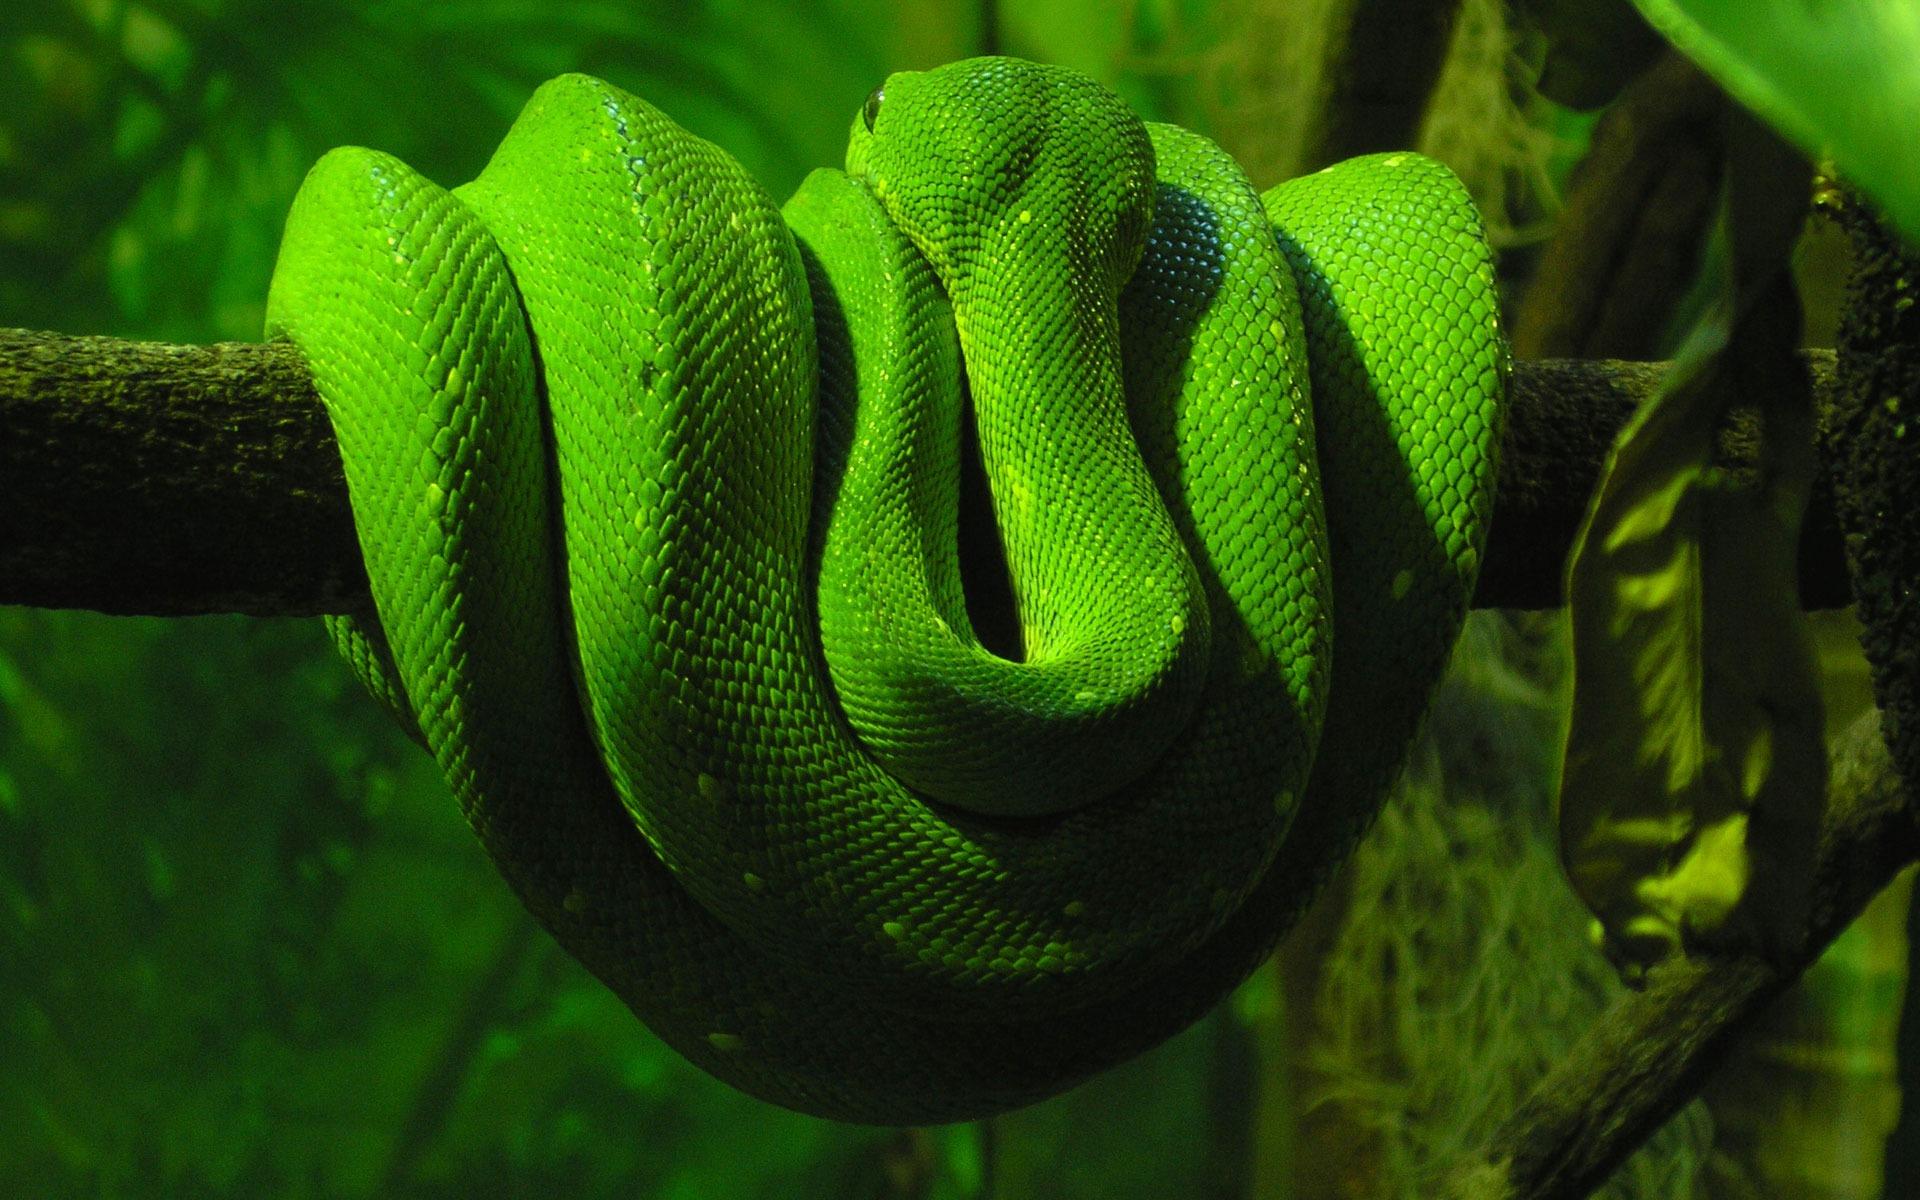 Green Snake Wallpaper Snakes Animals Wallpapers in jpg ...